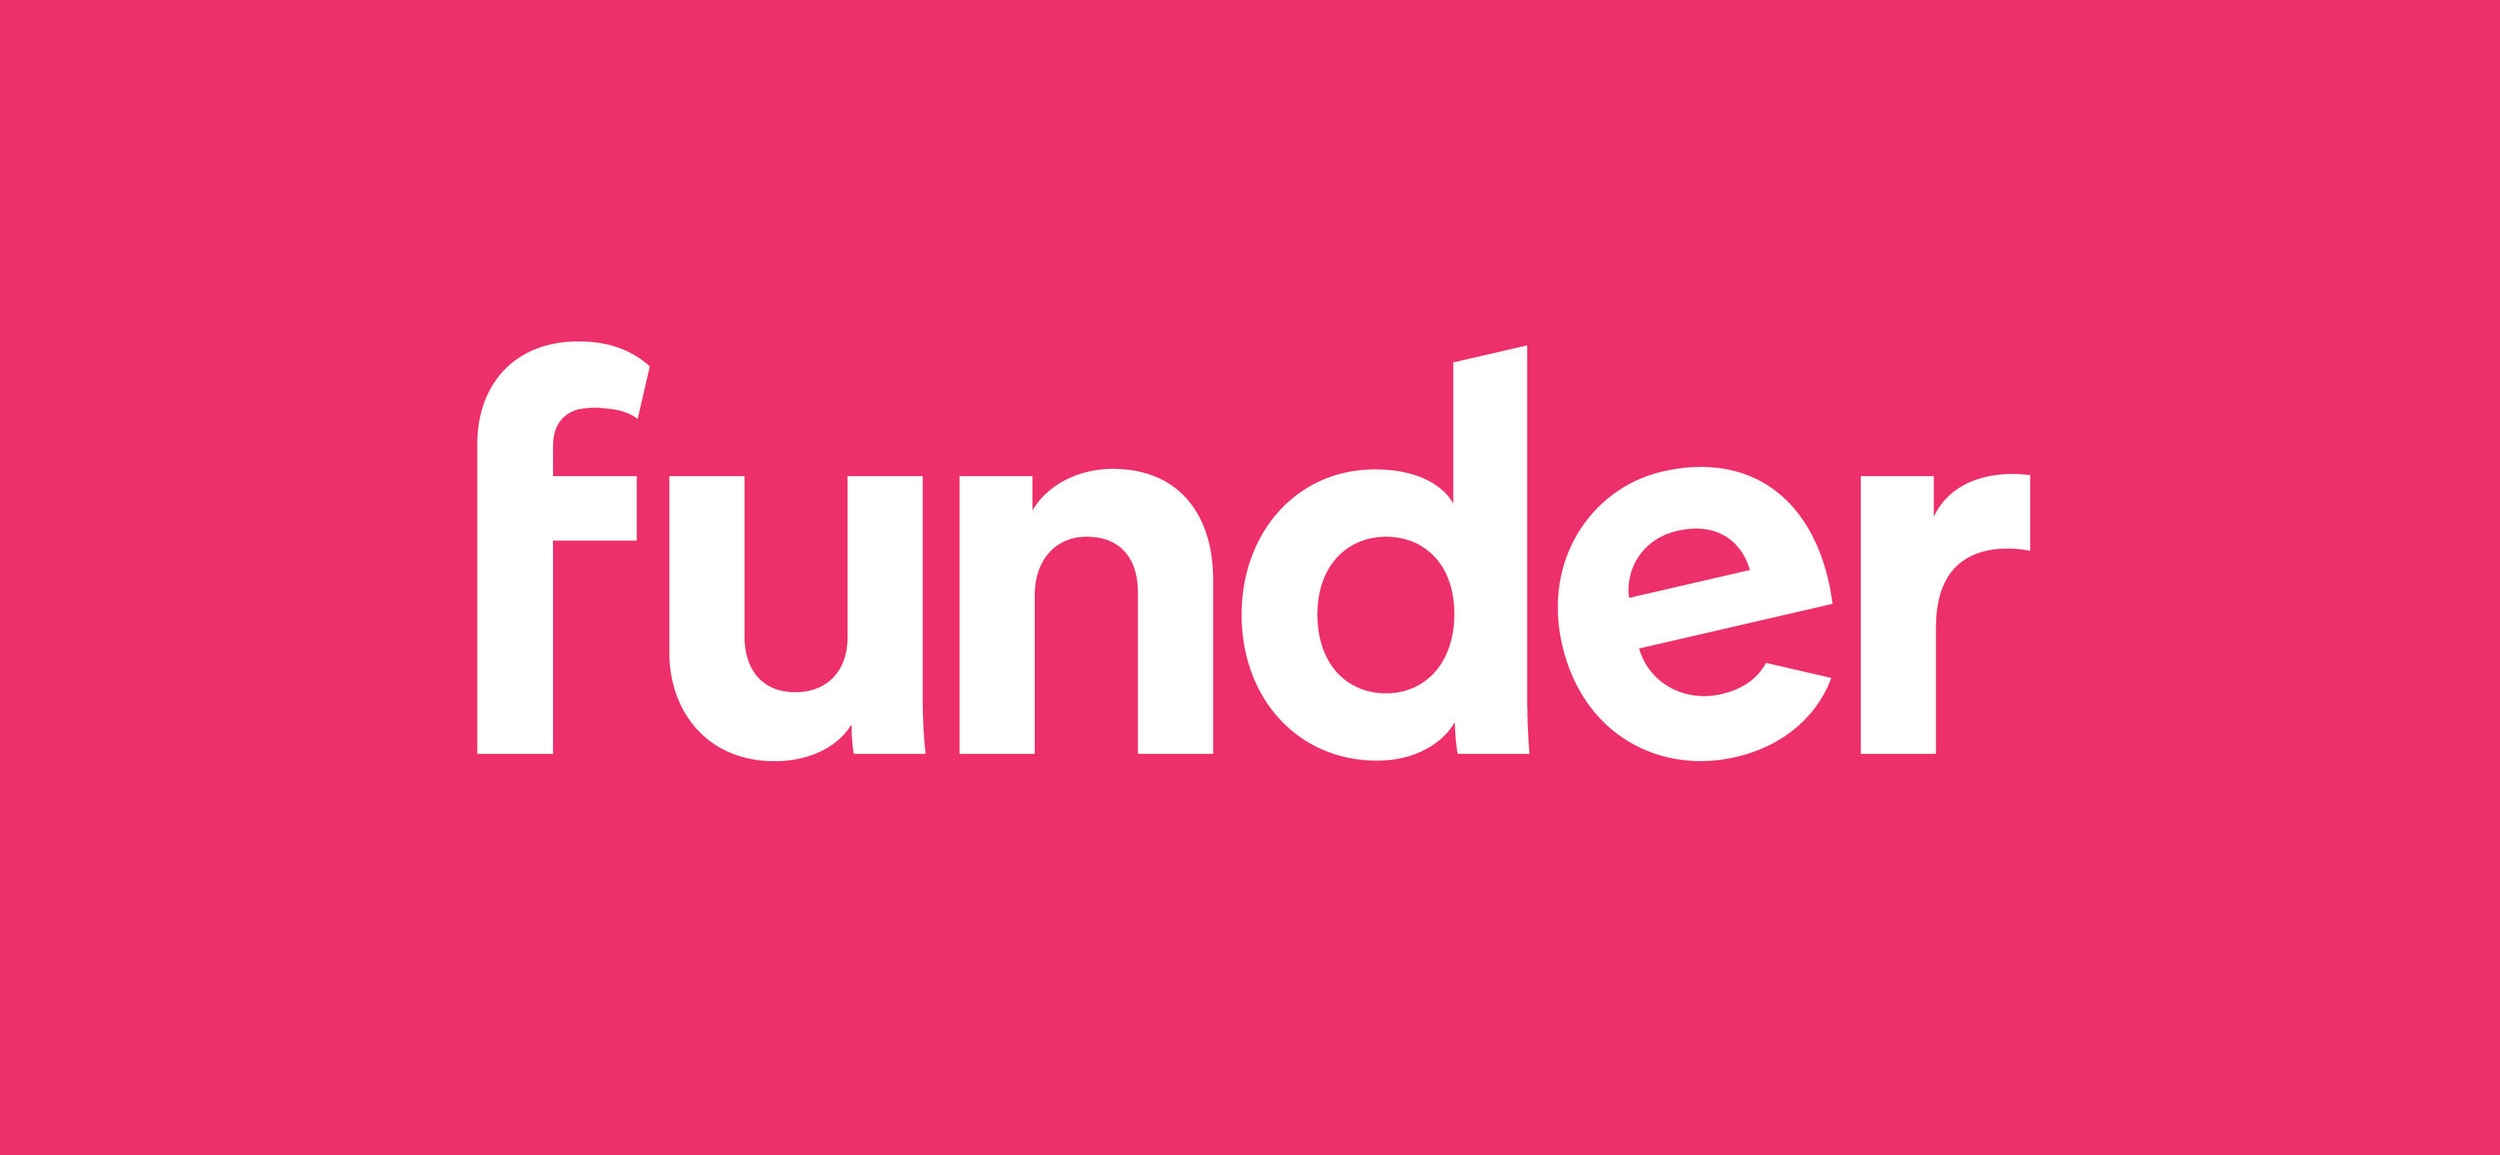 funder_horizontal_cerise_web.jpg